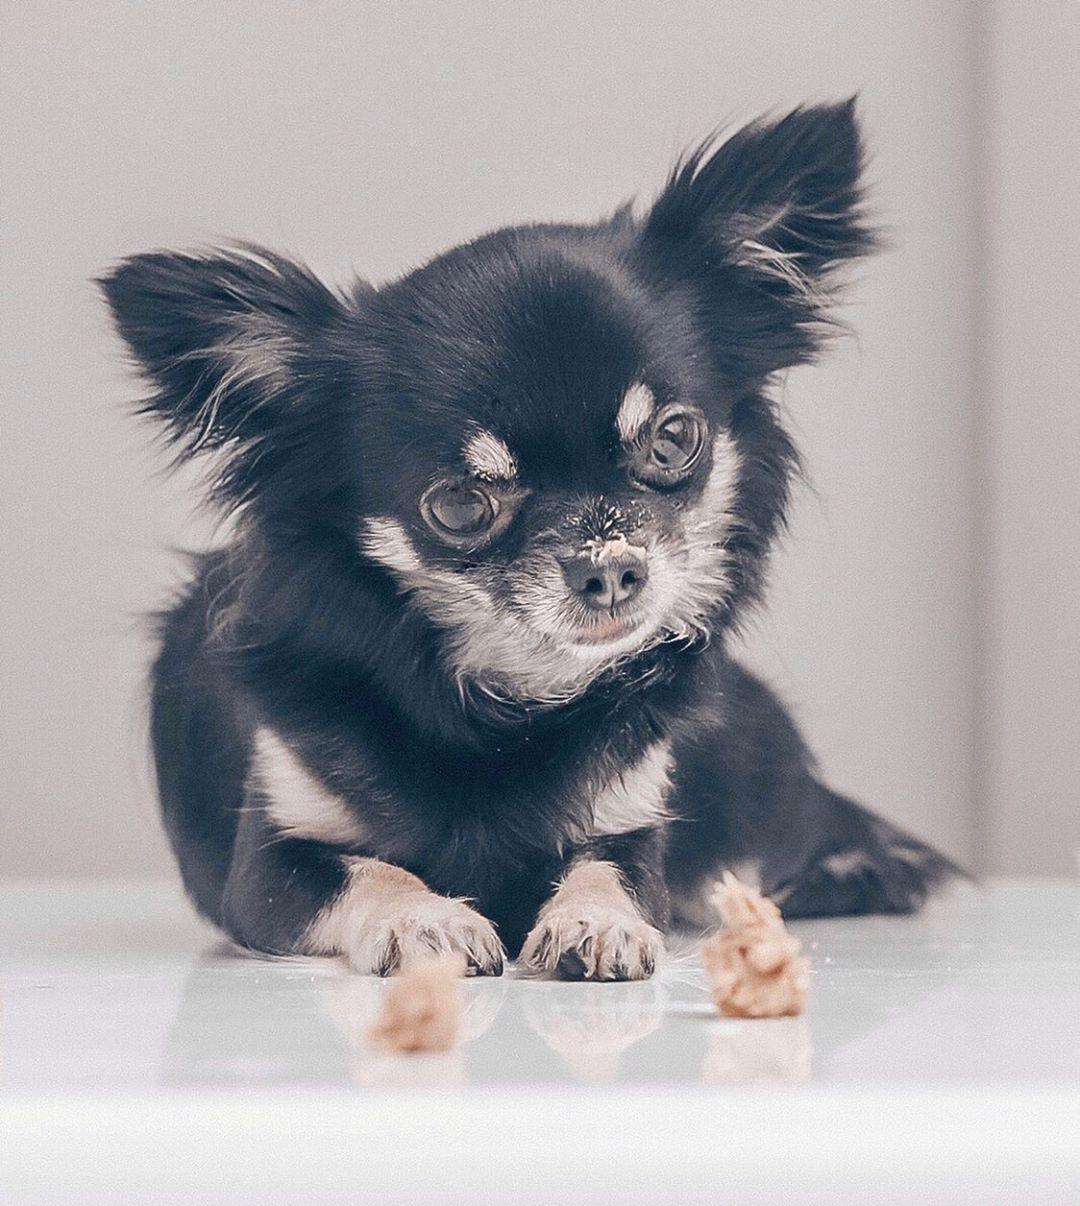 Chihuahua Kai On Instagram In Heaven Coz It S